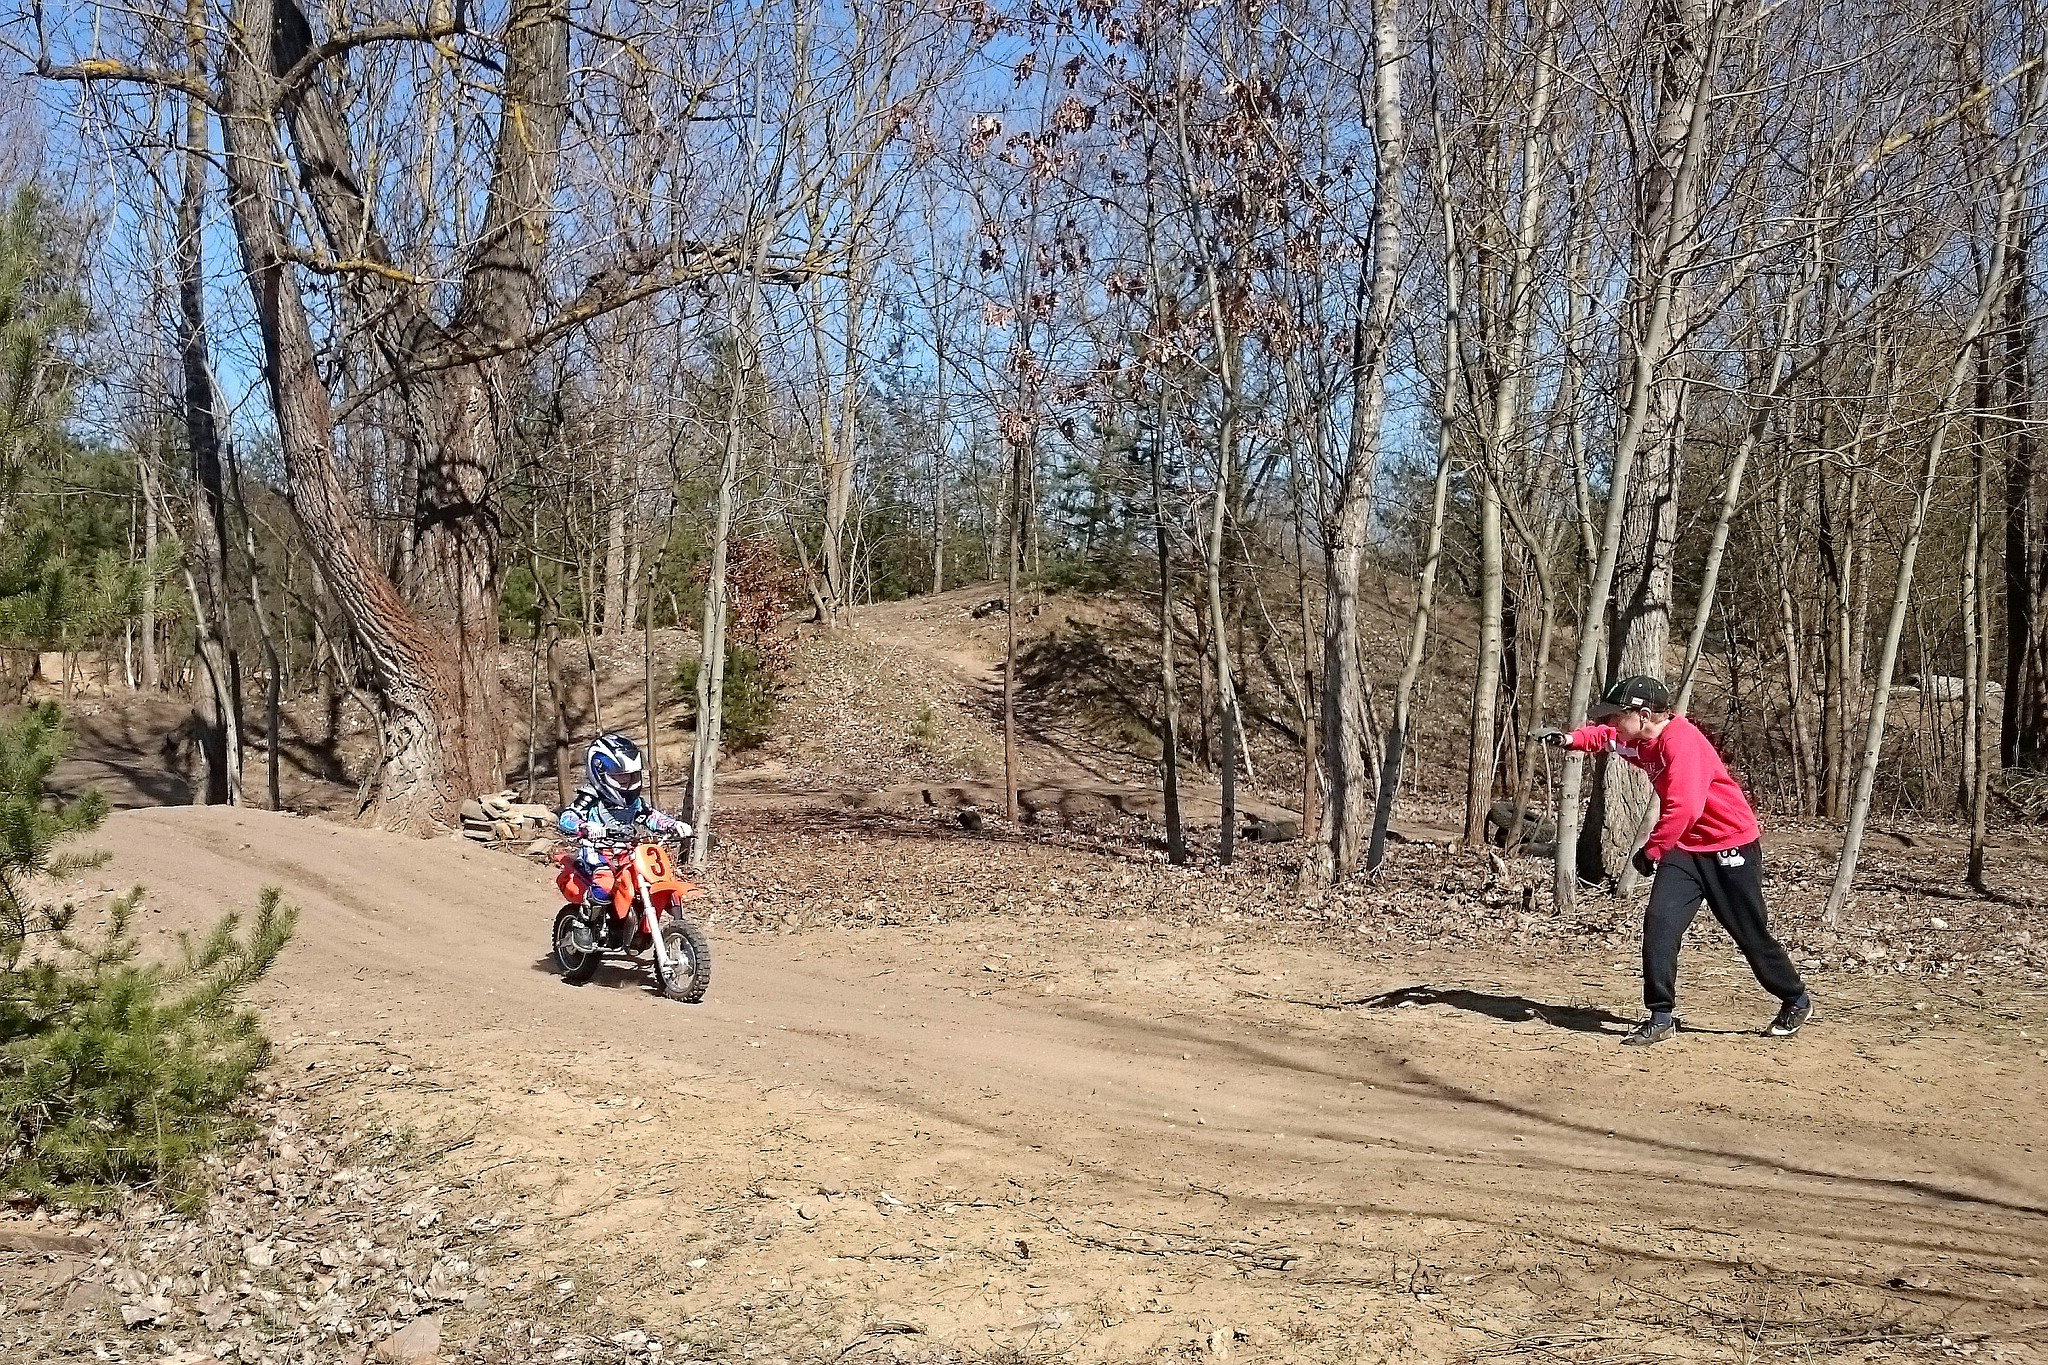 Motocross-Knirpse